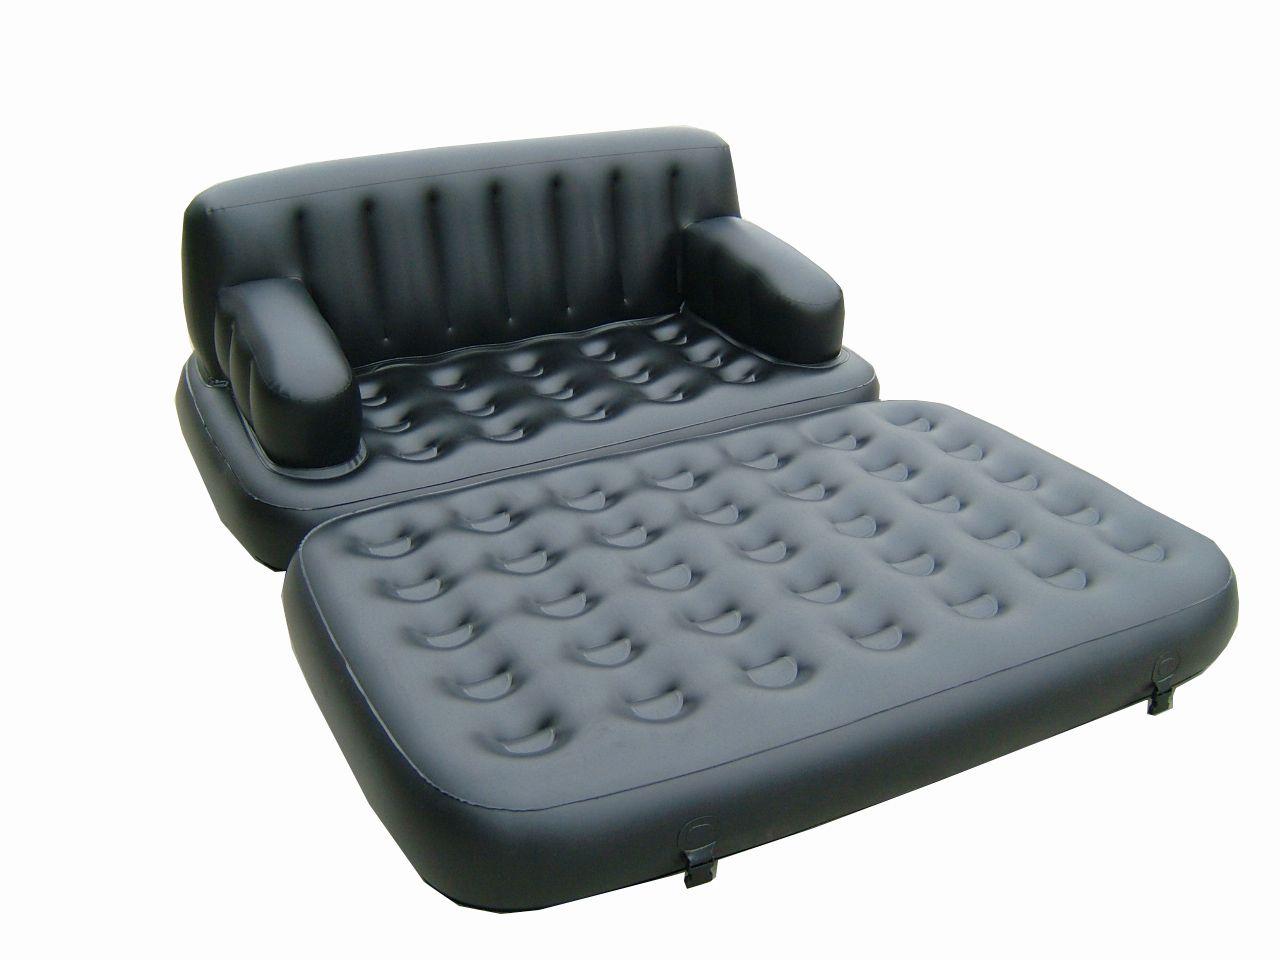 sofa. 5 in 1 air sofa bed price | facelinkbox sofa ideas